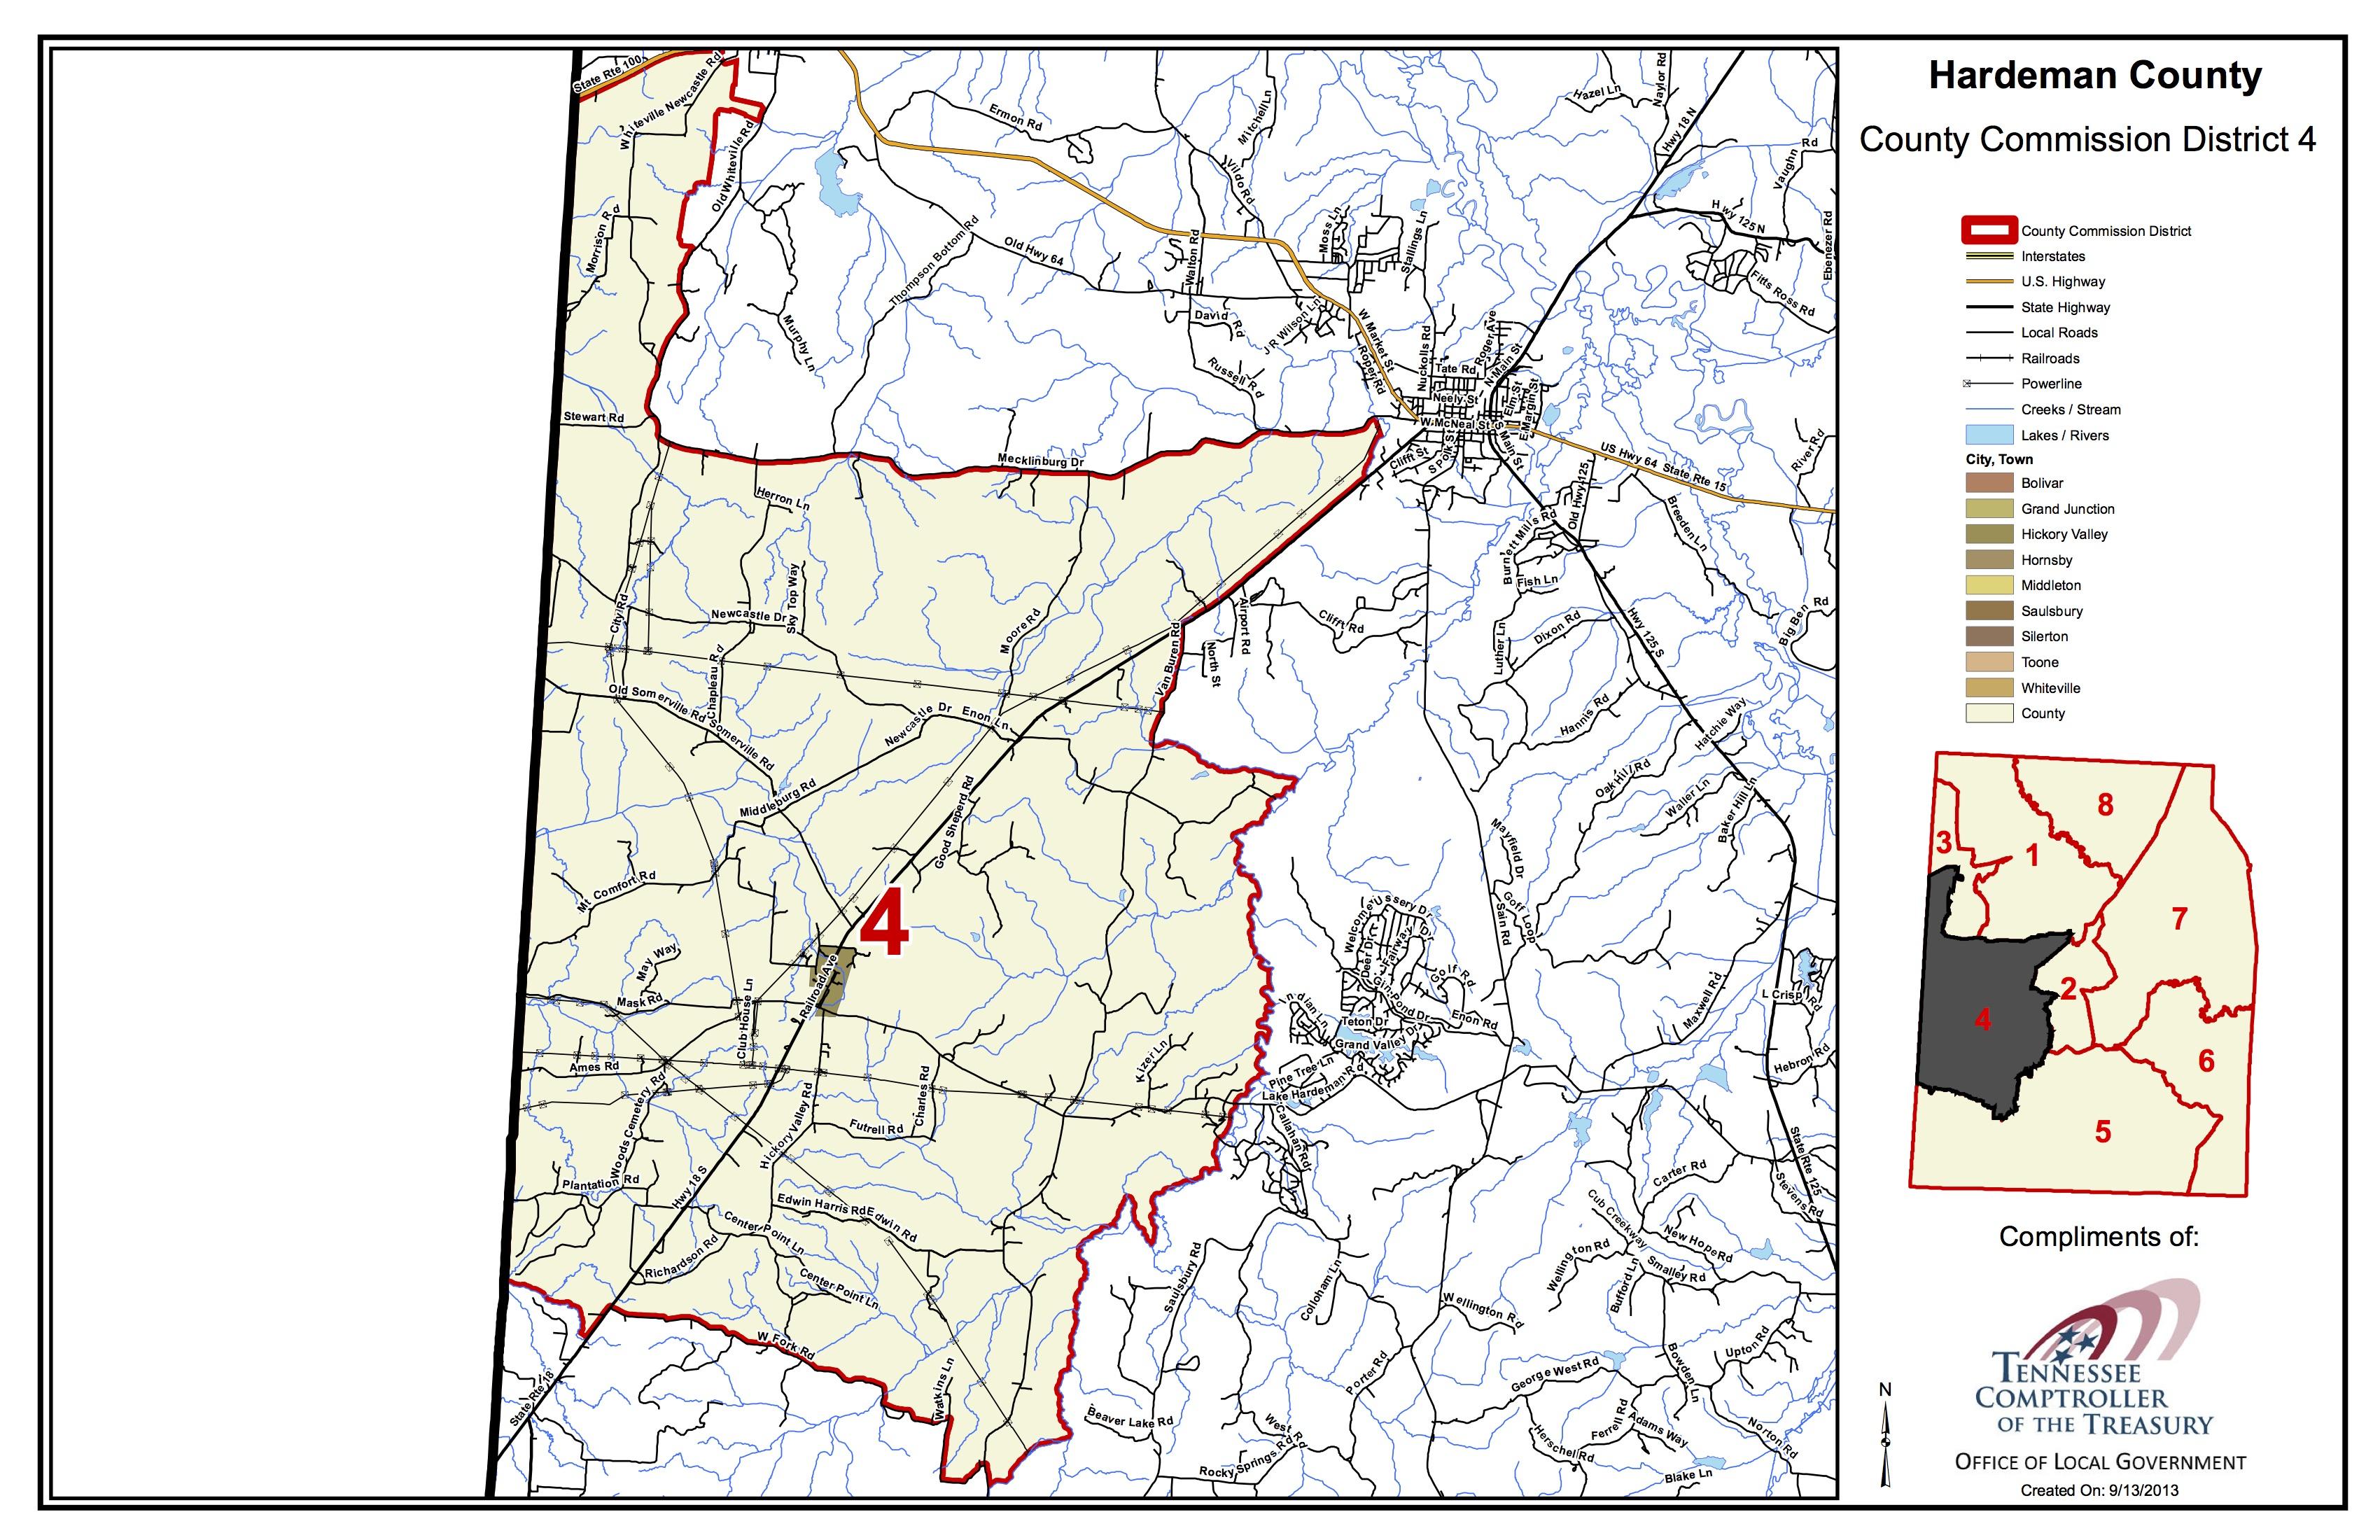 Hardeman County, TN Wall Map Premium Style by MarketMAPS